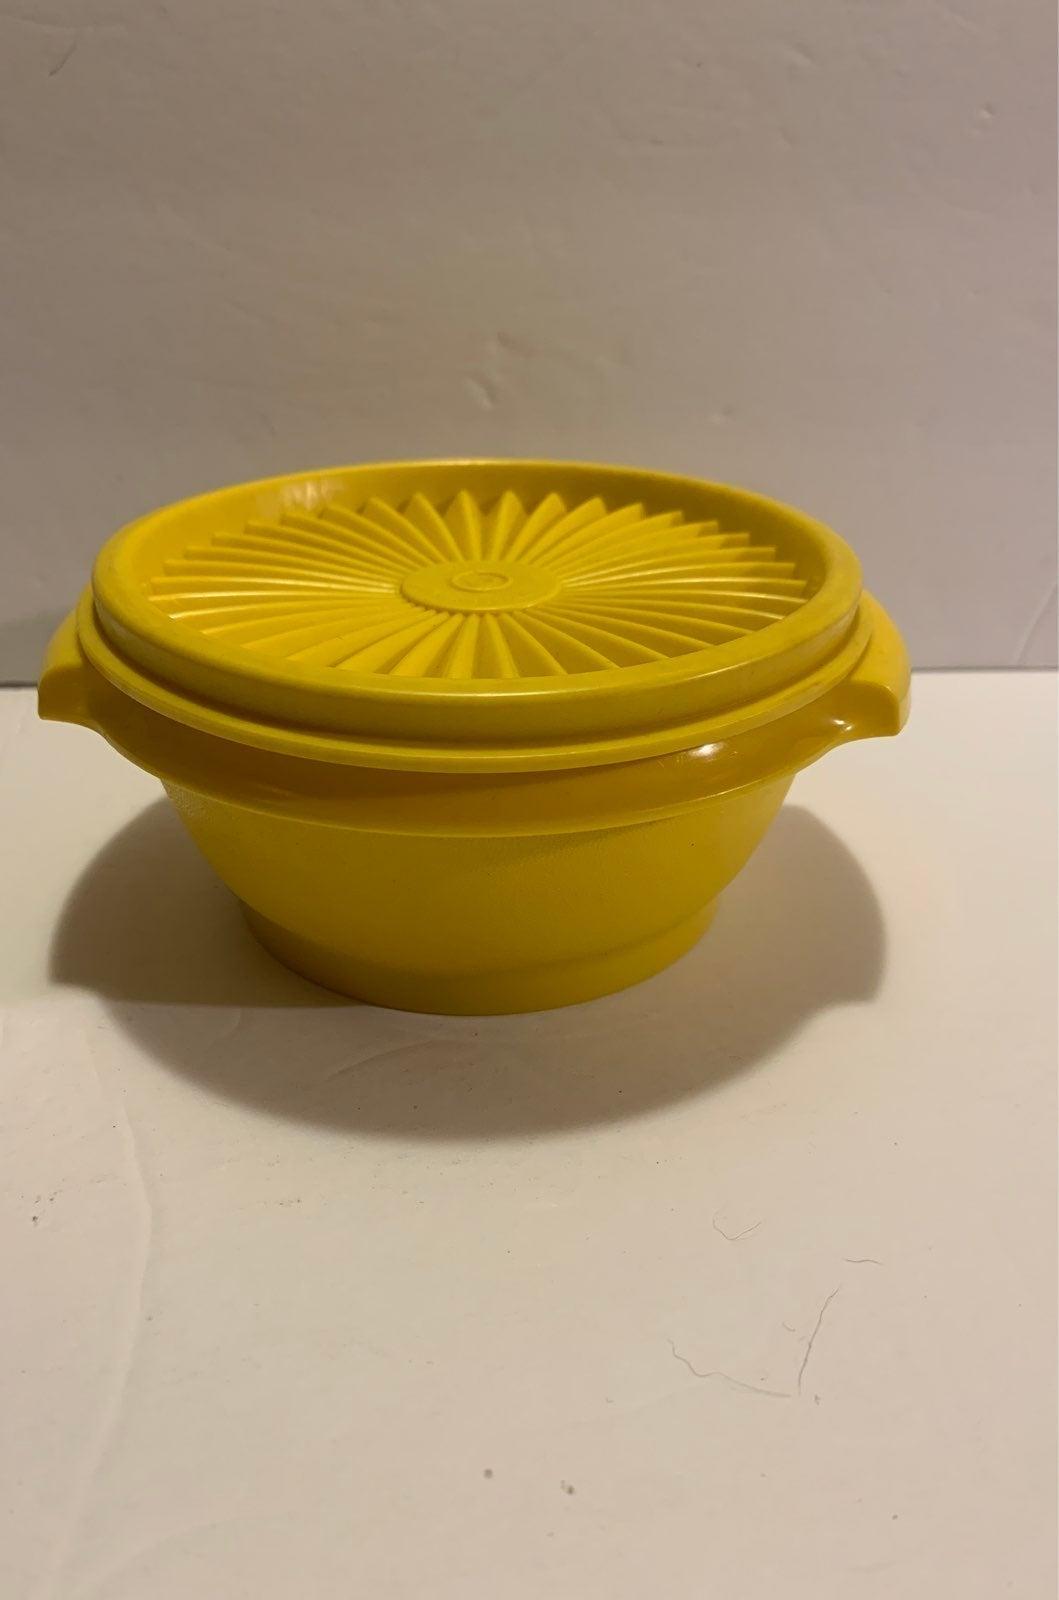 Tupperware Servalier Yellow Bowl W/ Lid